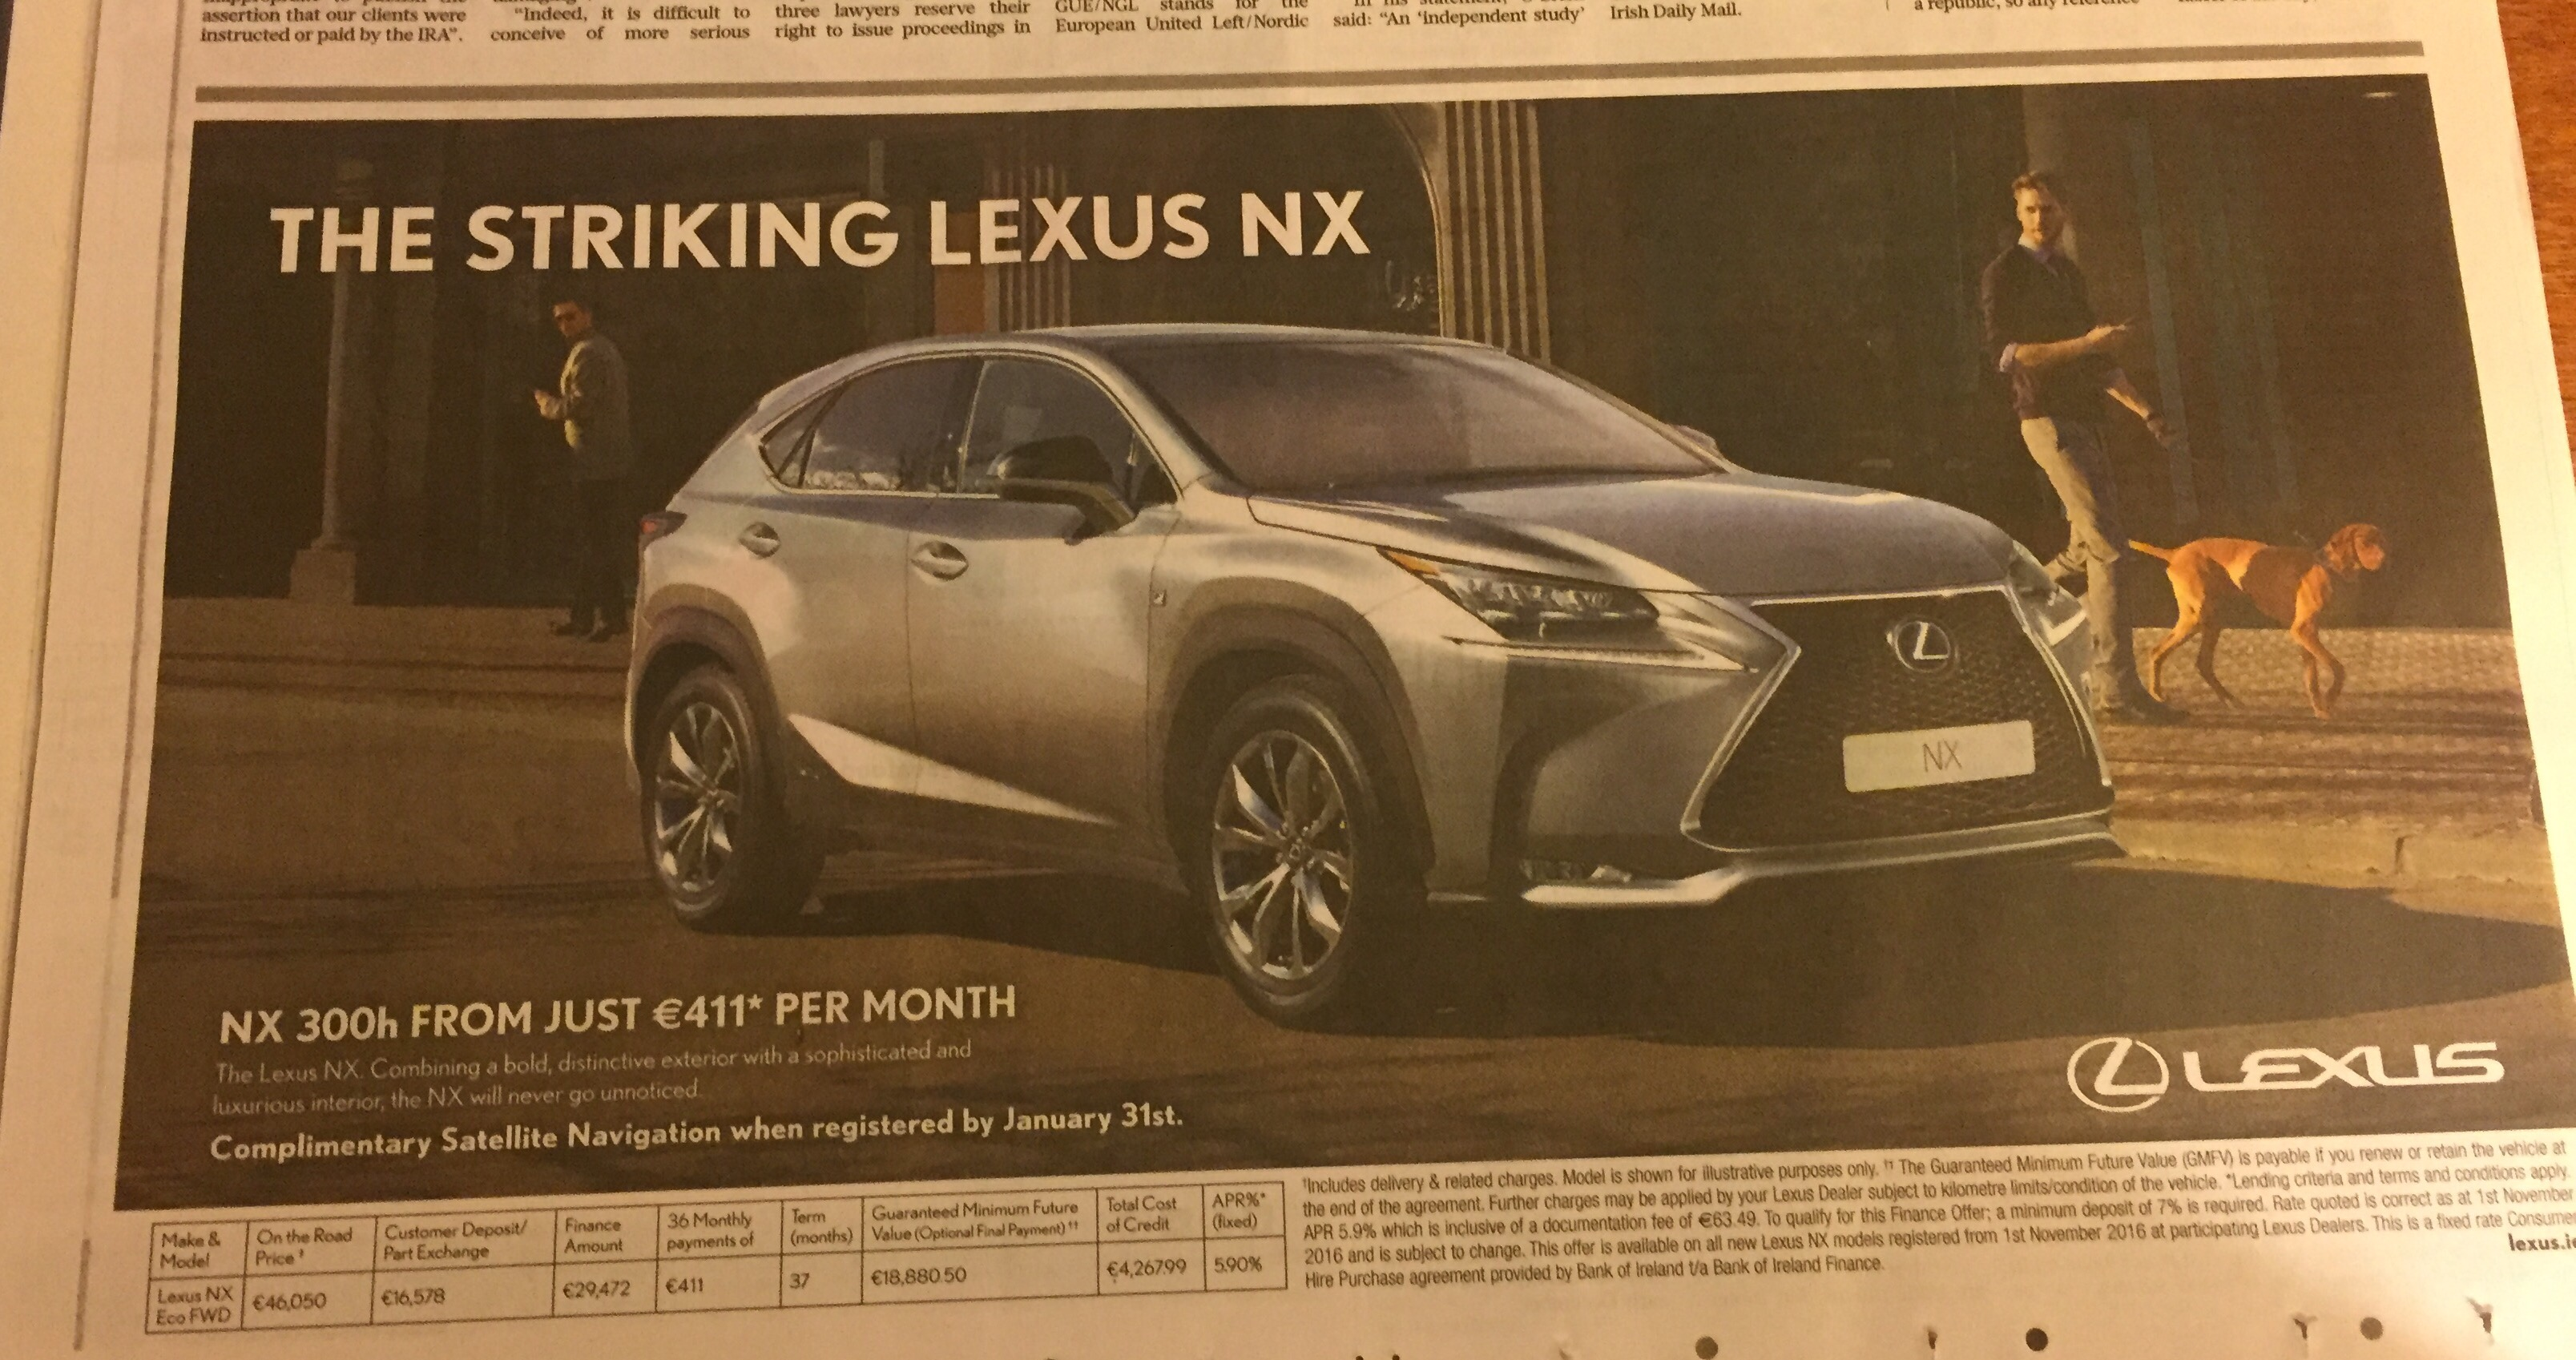 Lexus NX – The striking Lexus NX